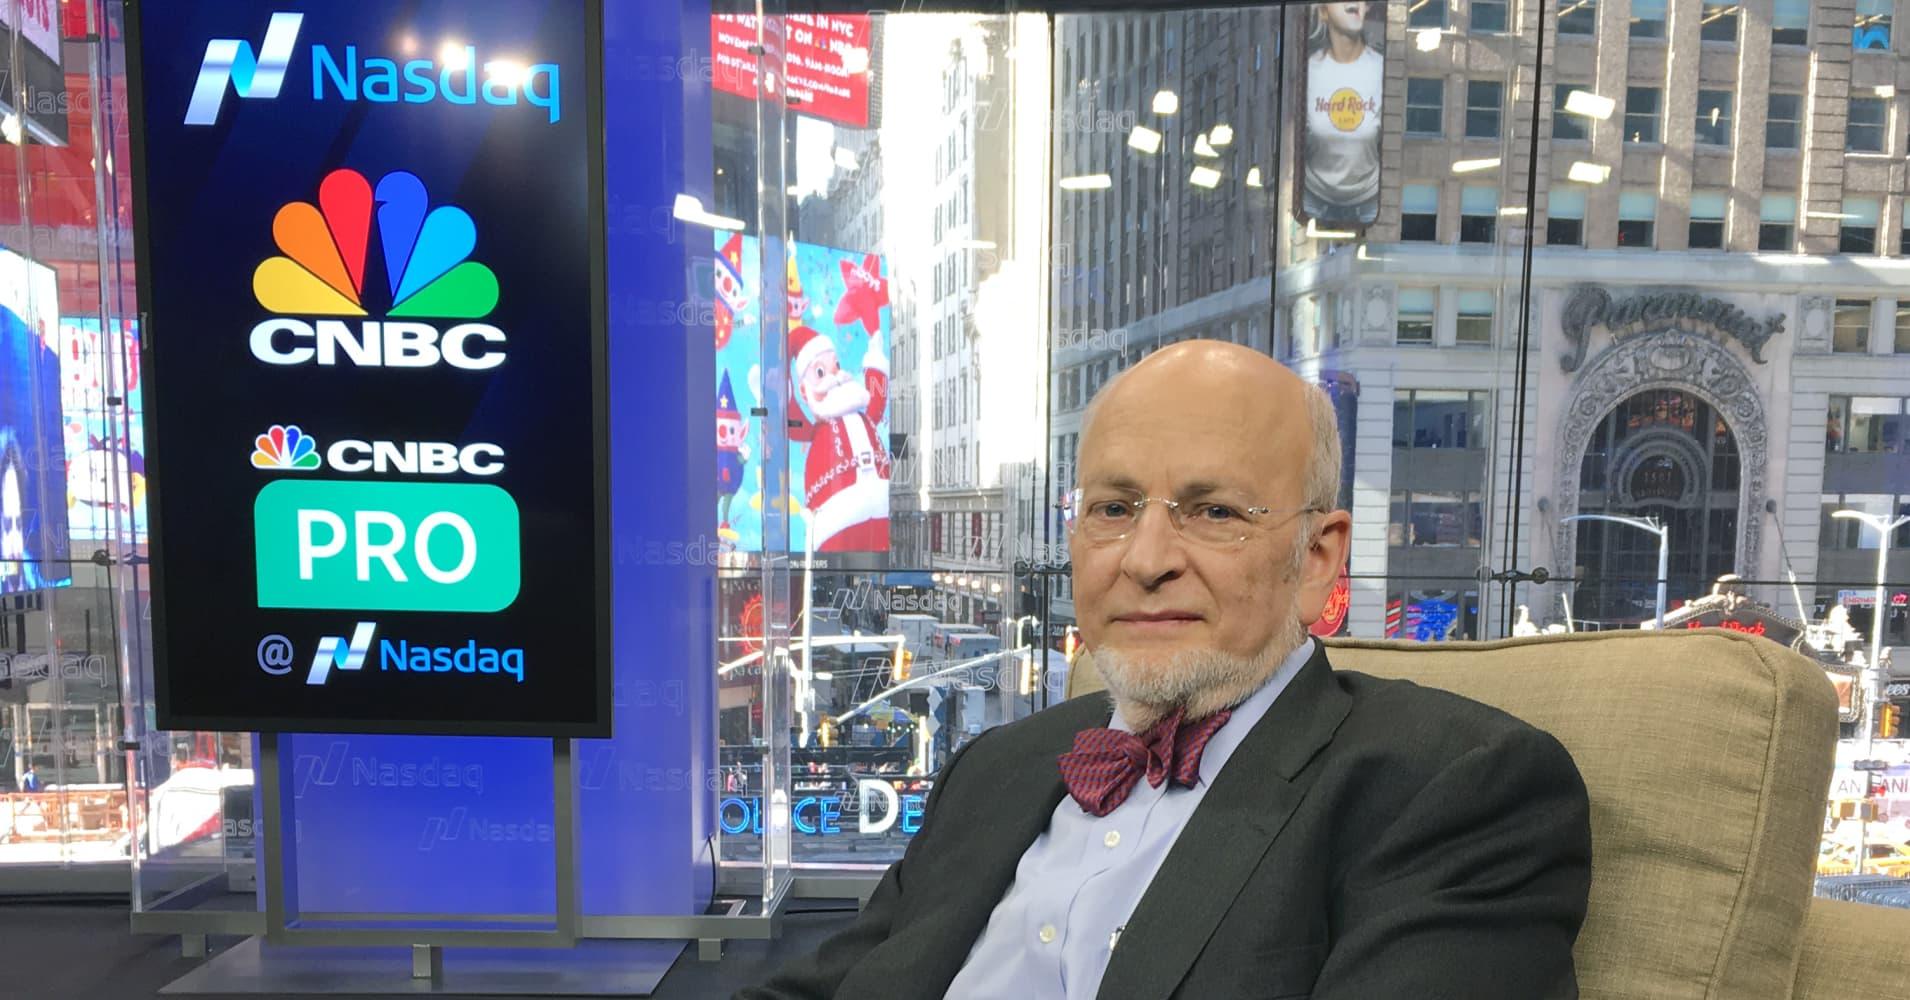 S&P's index guru David Blitzer on passive investing, market valuation and Trump-Reagan comparisons